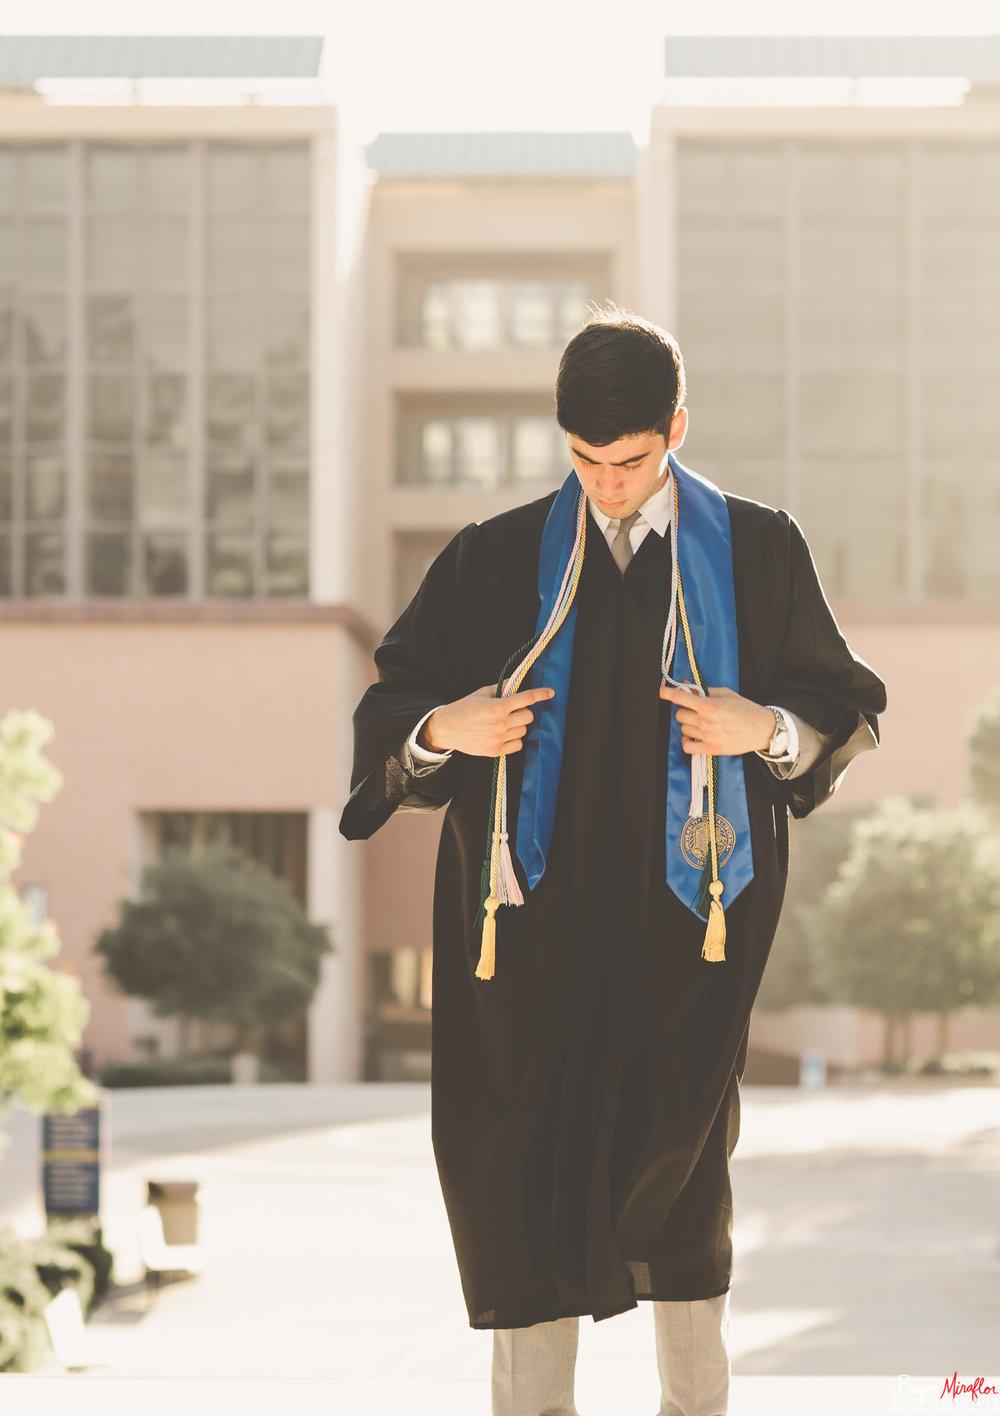 0319-Bryan-Miraflor-Photography-Adrian-Graduation-Photoshoot-0052.jpg